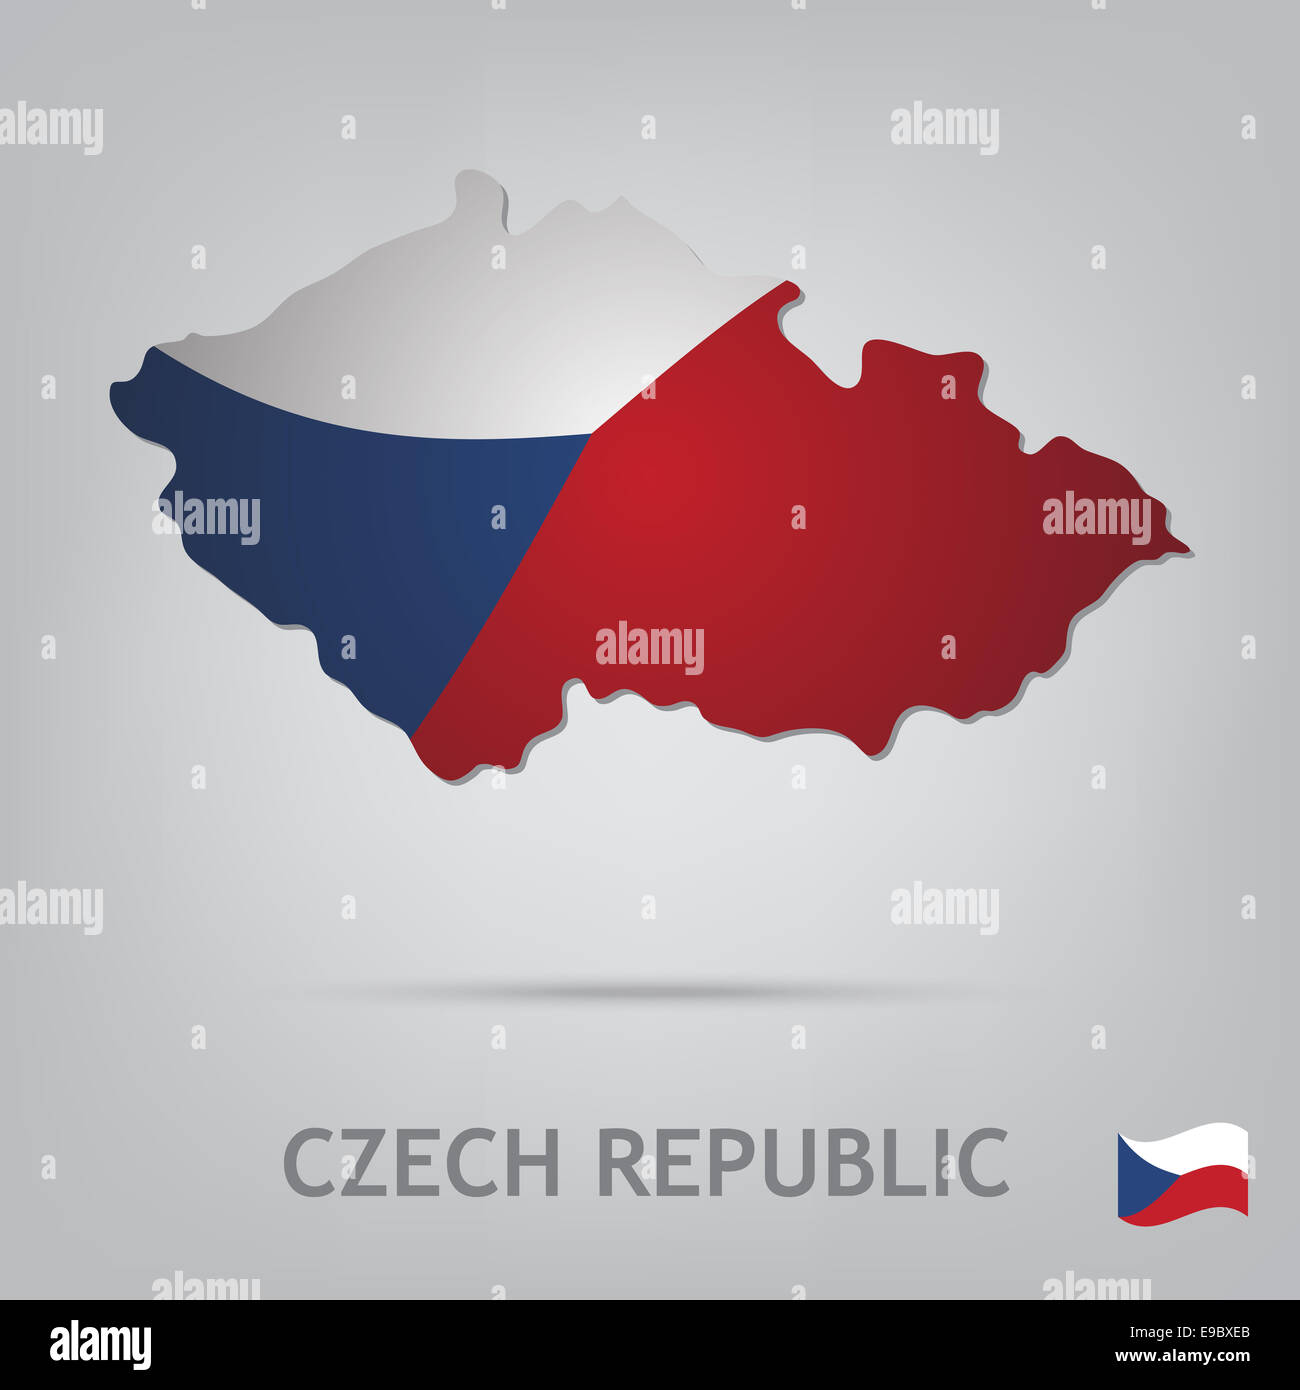 czech republic - Stock Image